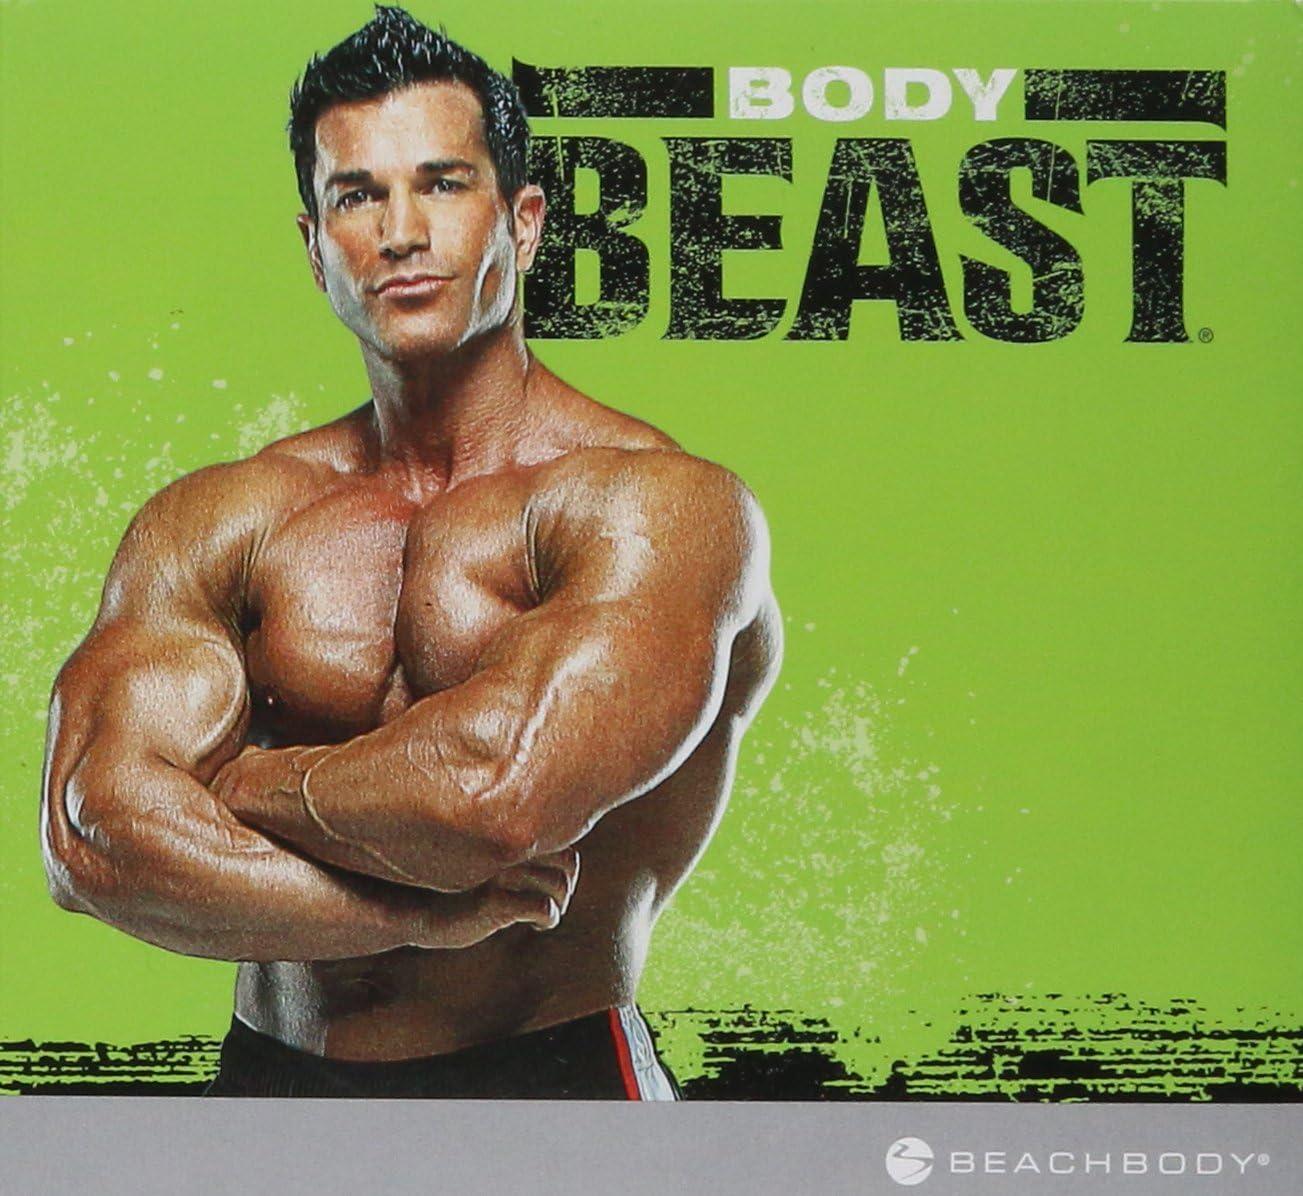 Beachbody Body Beast DVD Workout